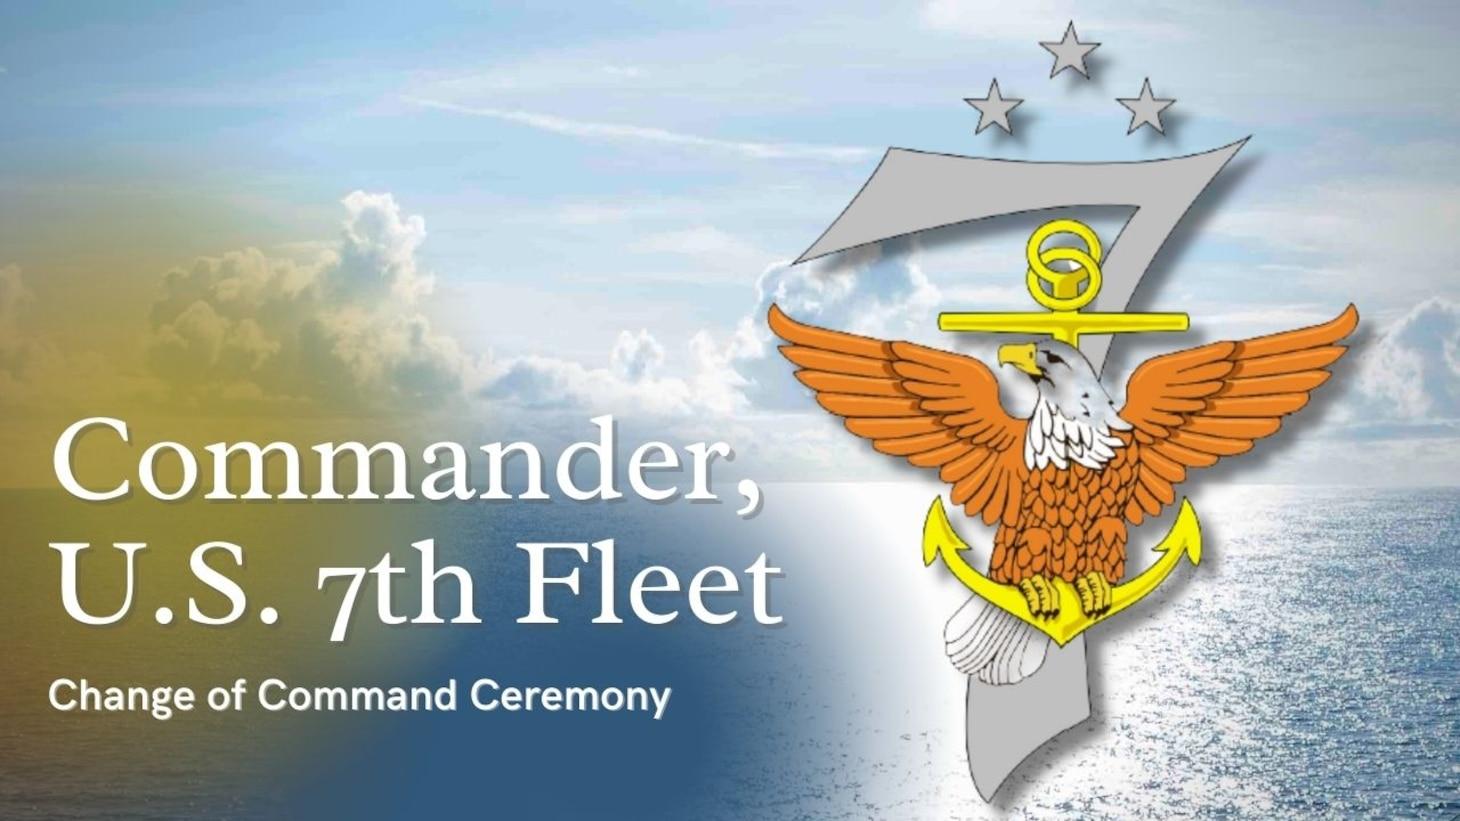 U.S. 7th Fleet will hold a change of command ceremony July 8 at the Fleet Activities Yokosuka Fleet Theater.